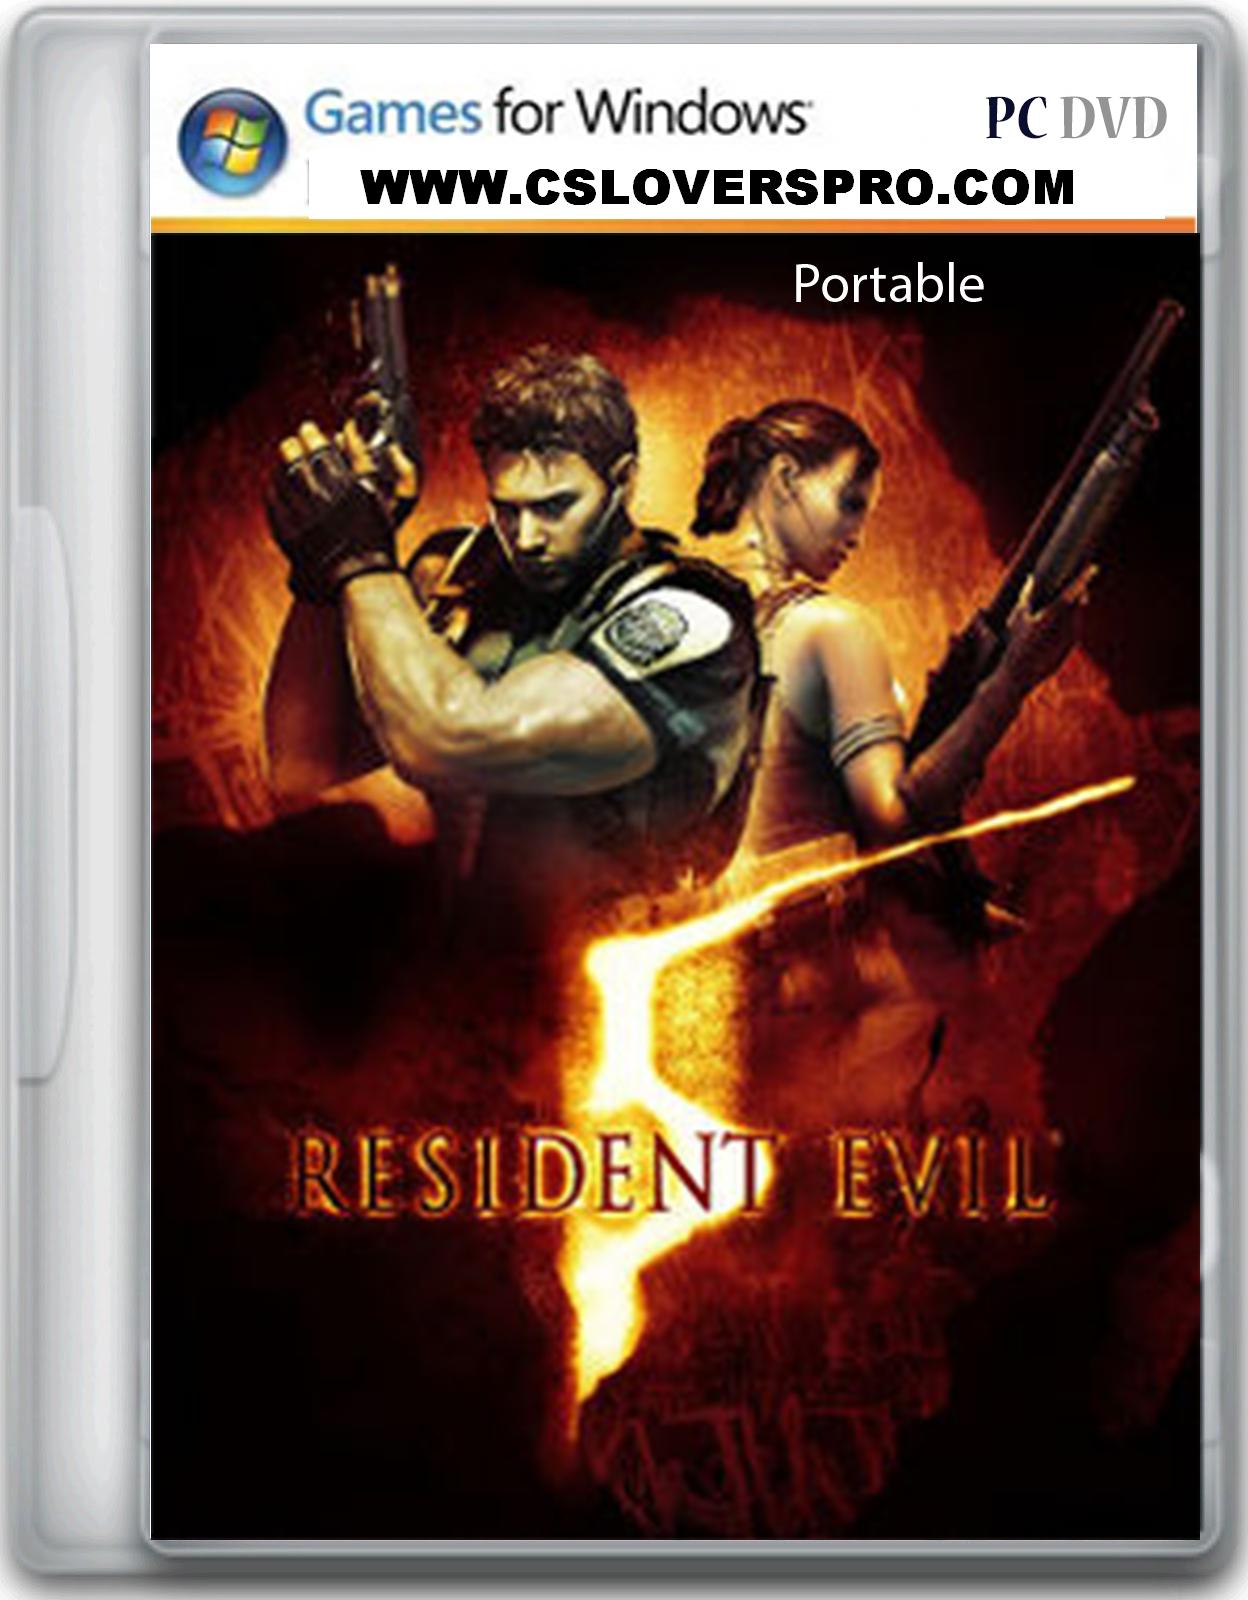 Resident Evil 5 Highly Compressed Pc Game - shotsletter